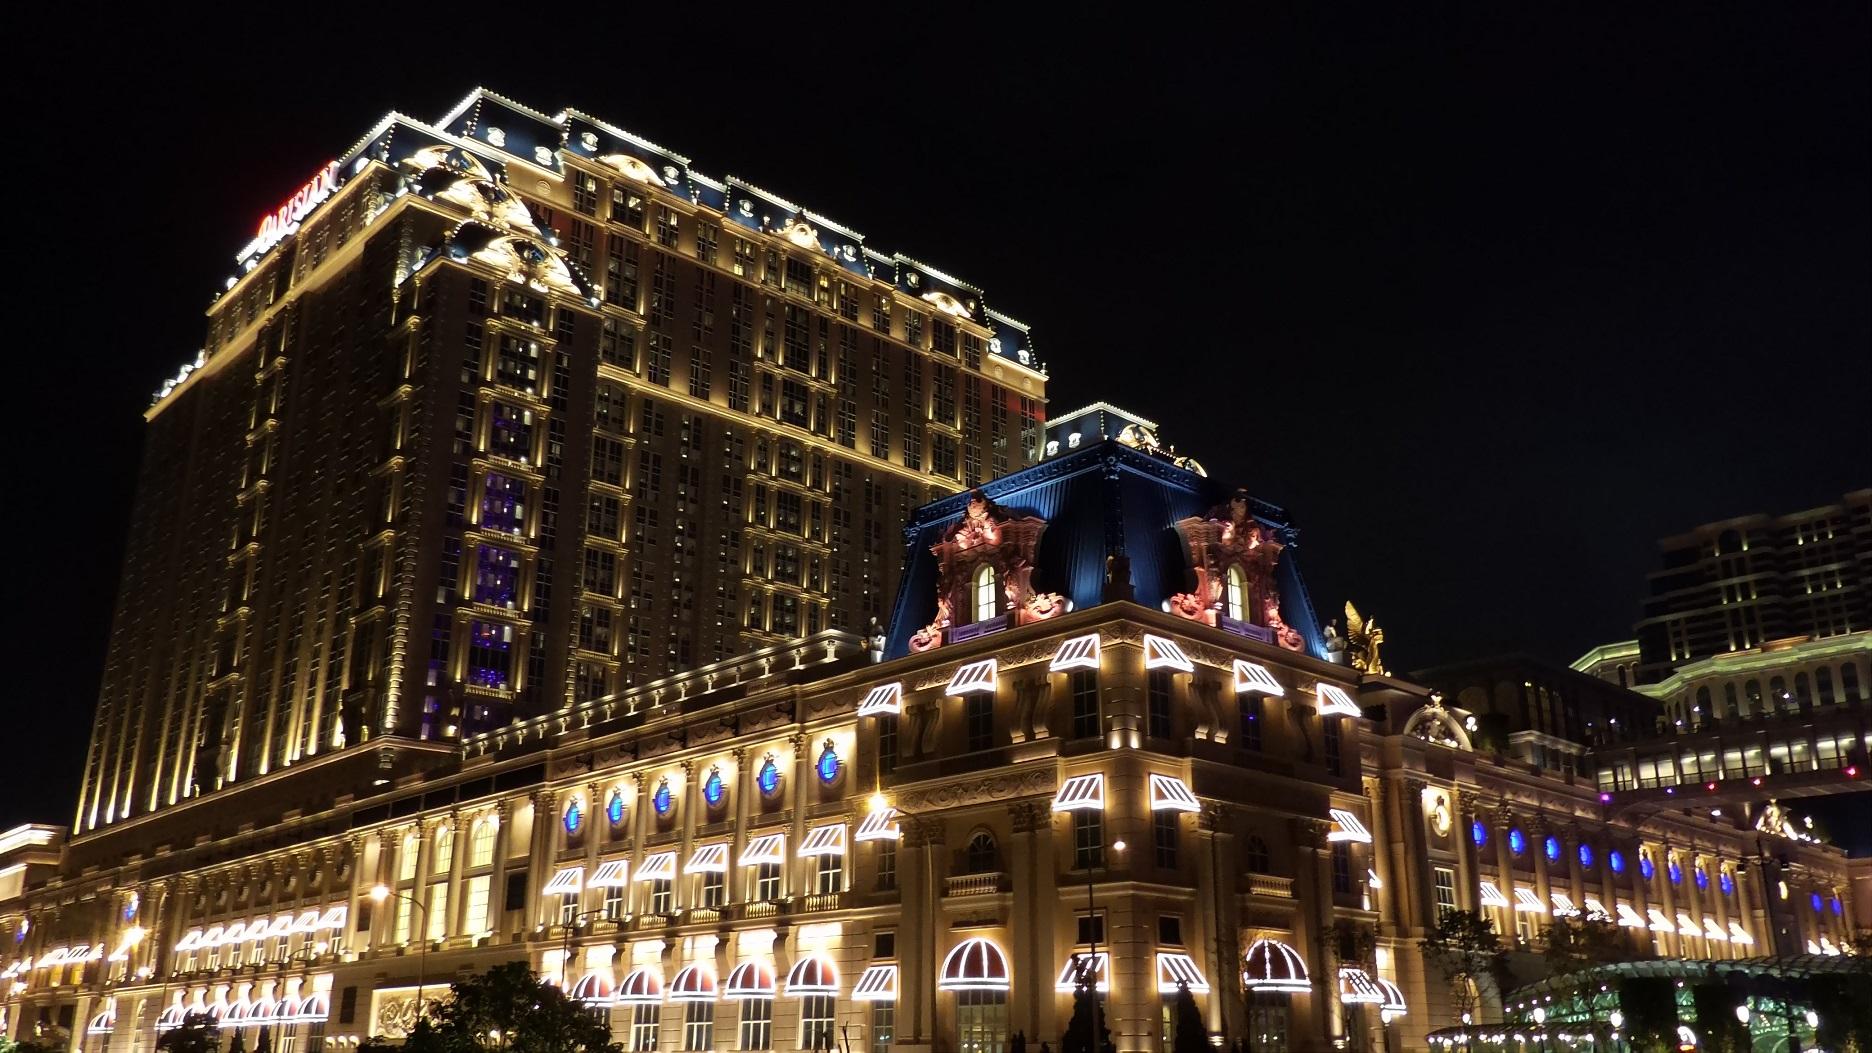 Parisian Macao hotel and resort at nighttime.